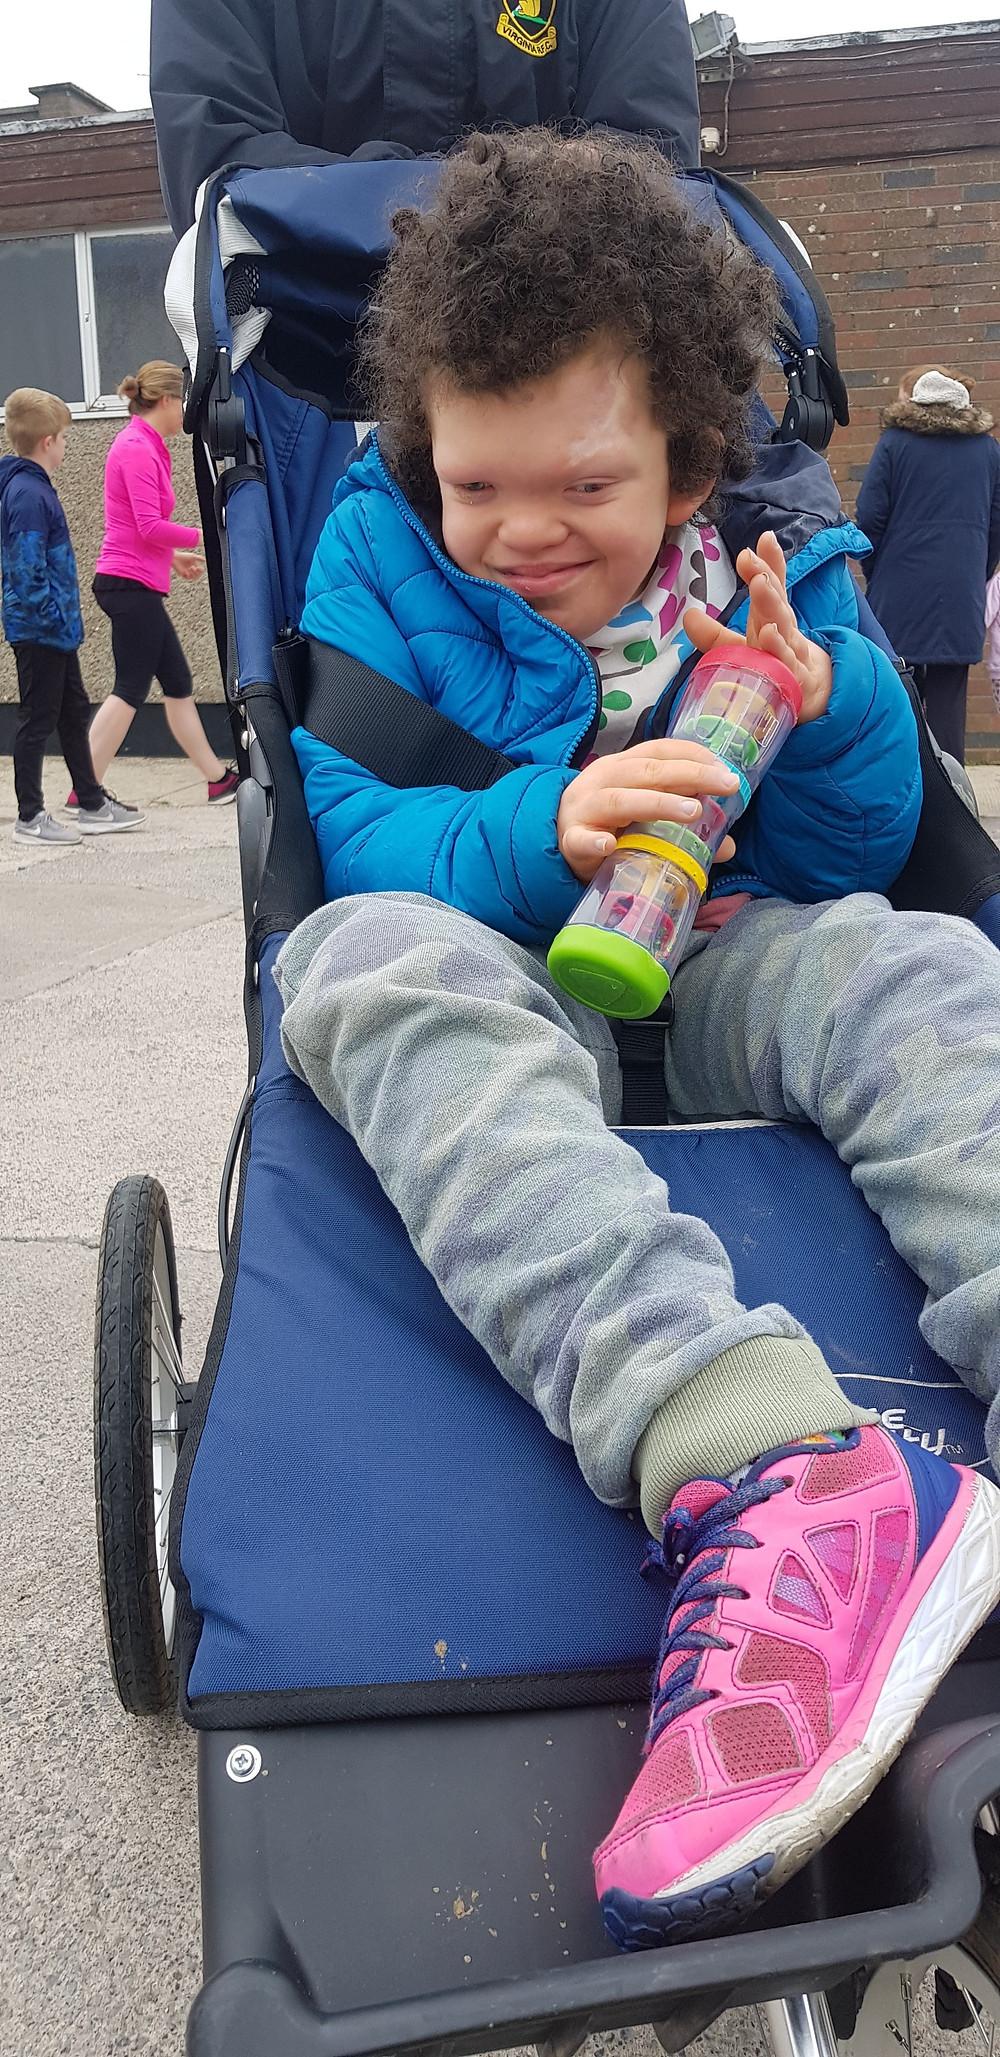 Carys's Sponsored Walk. aliisaacstoryteller.com. #livingwithaspecialneedschild 'cardiofaciocutaneoussyndrome #raredesease